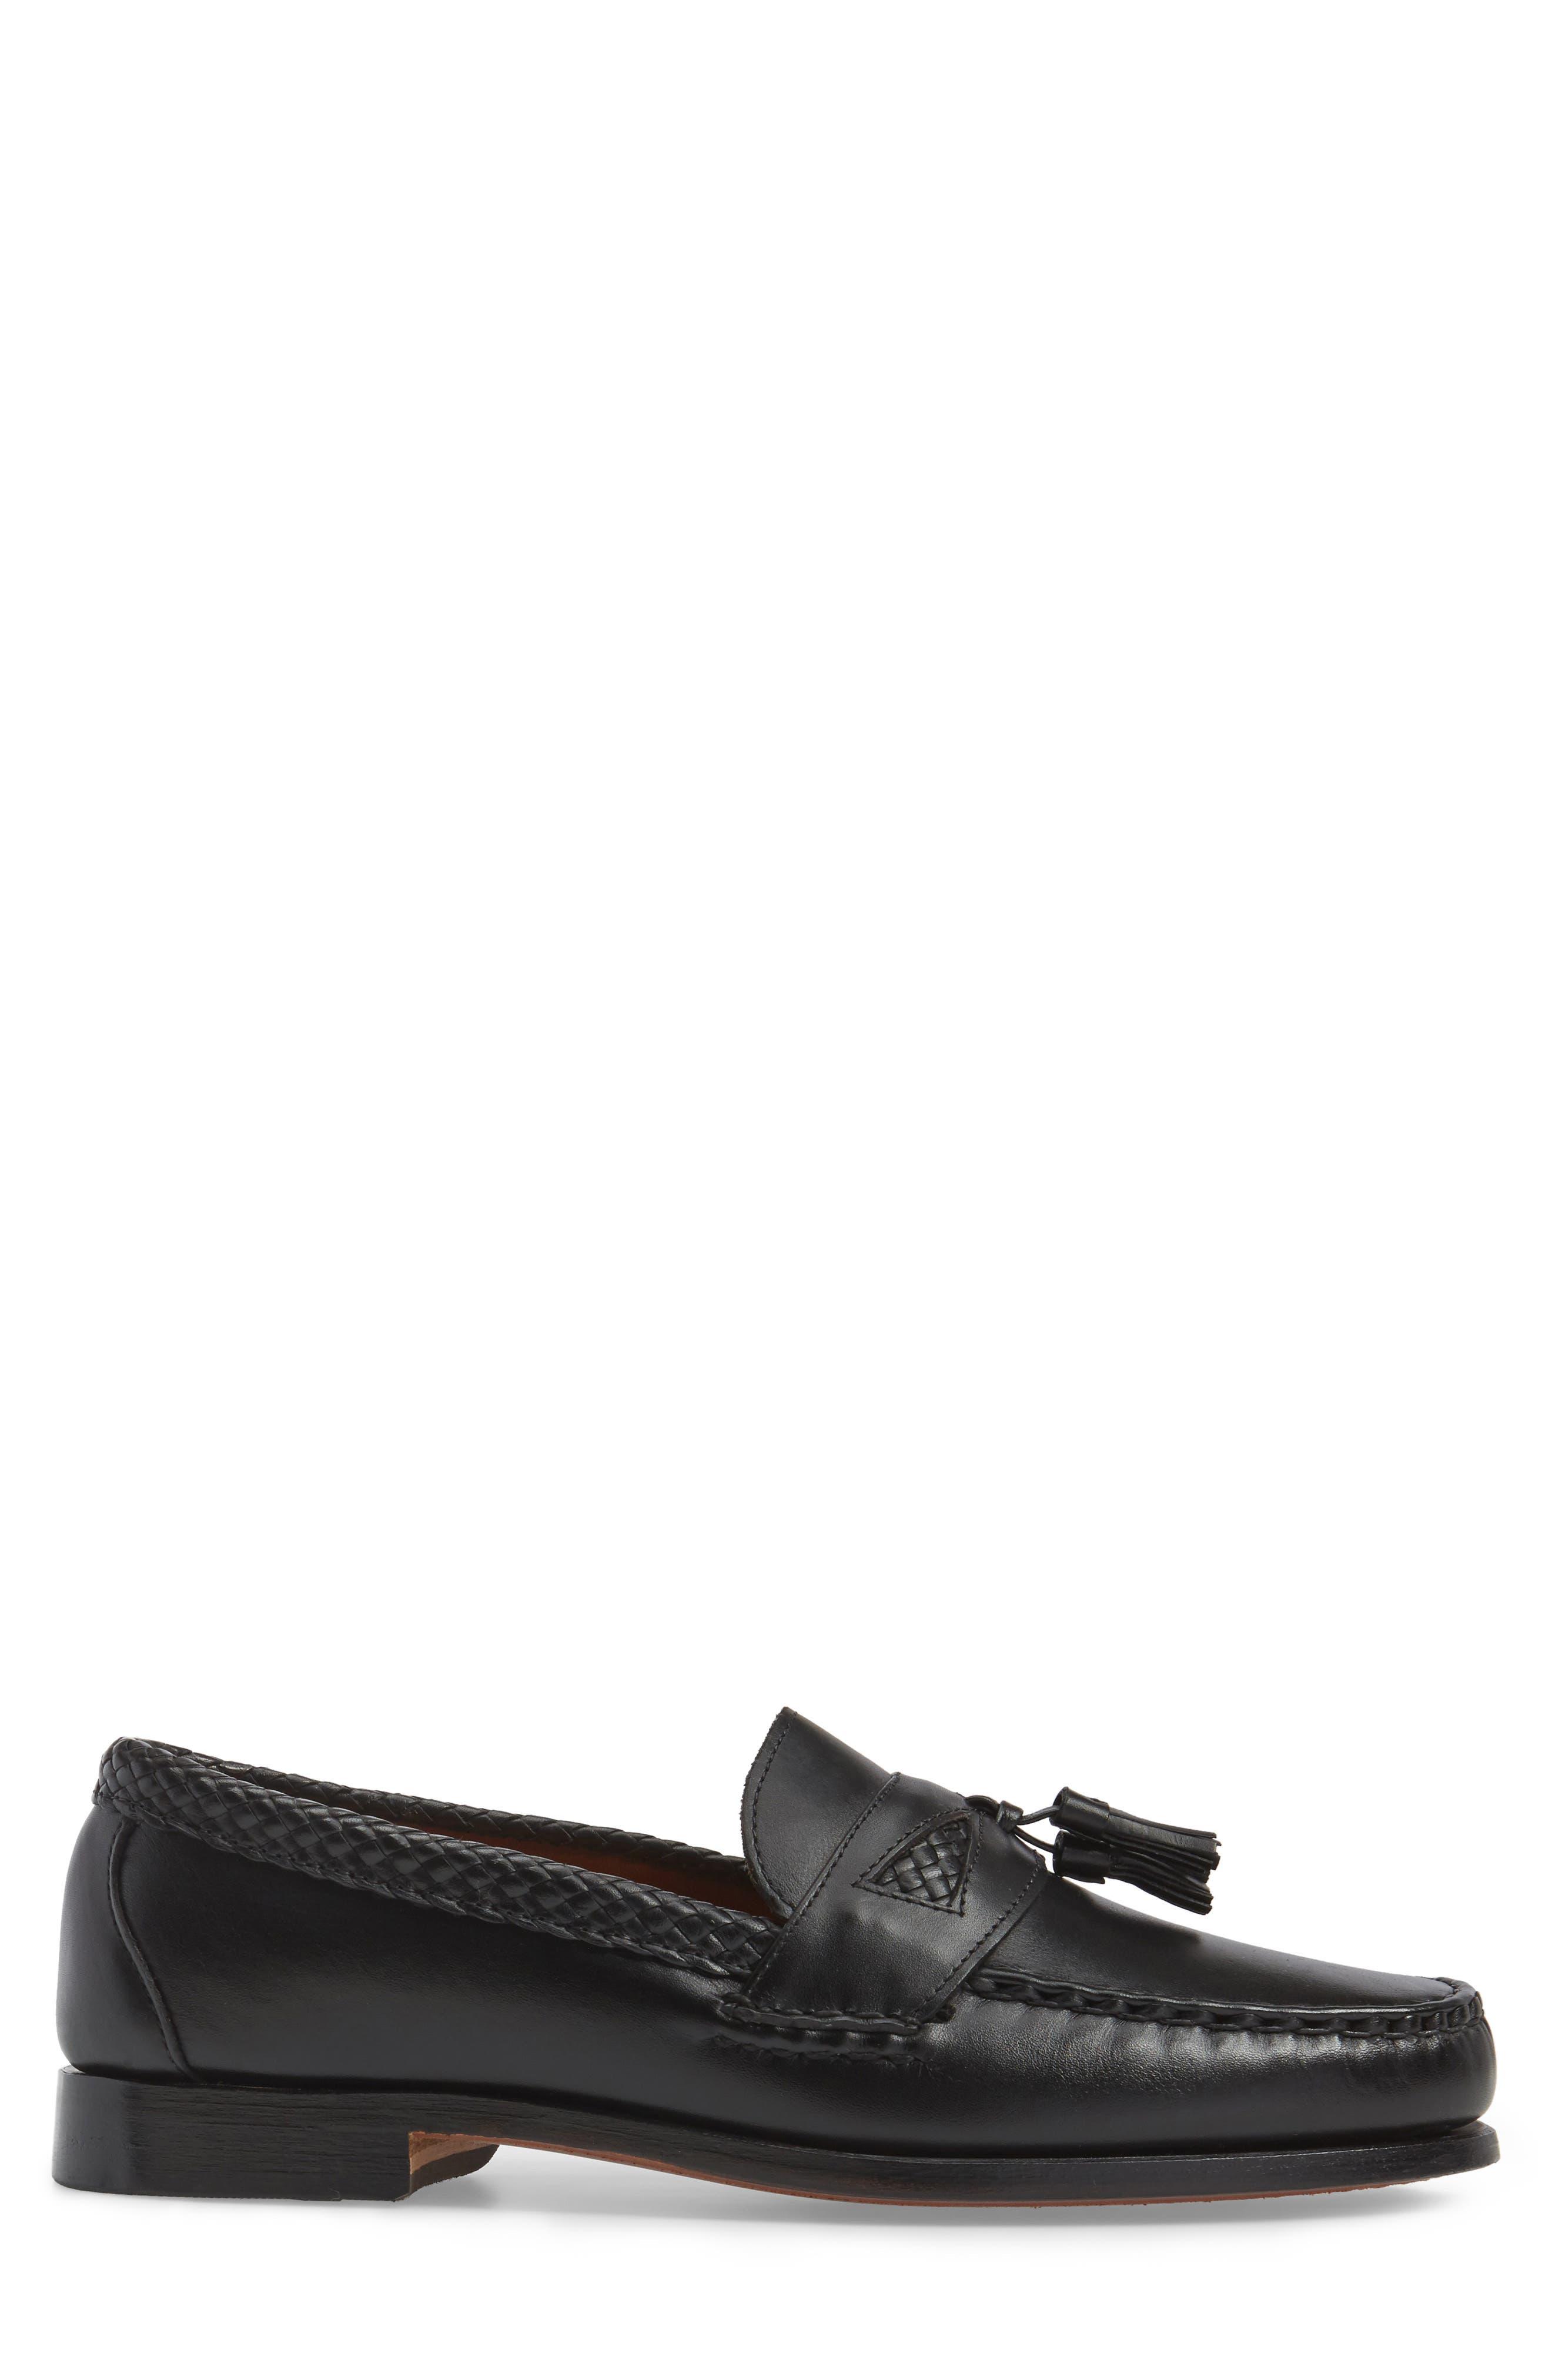 ALLEN EDMONDS, 'Maxfield' Loafer, Alternate thumbnail 3, color, BLACK